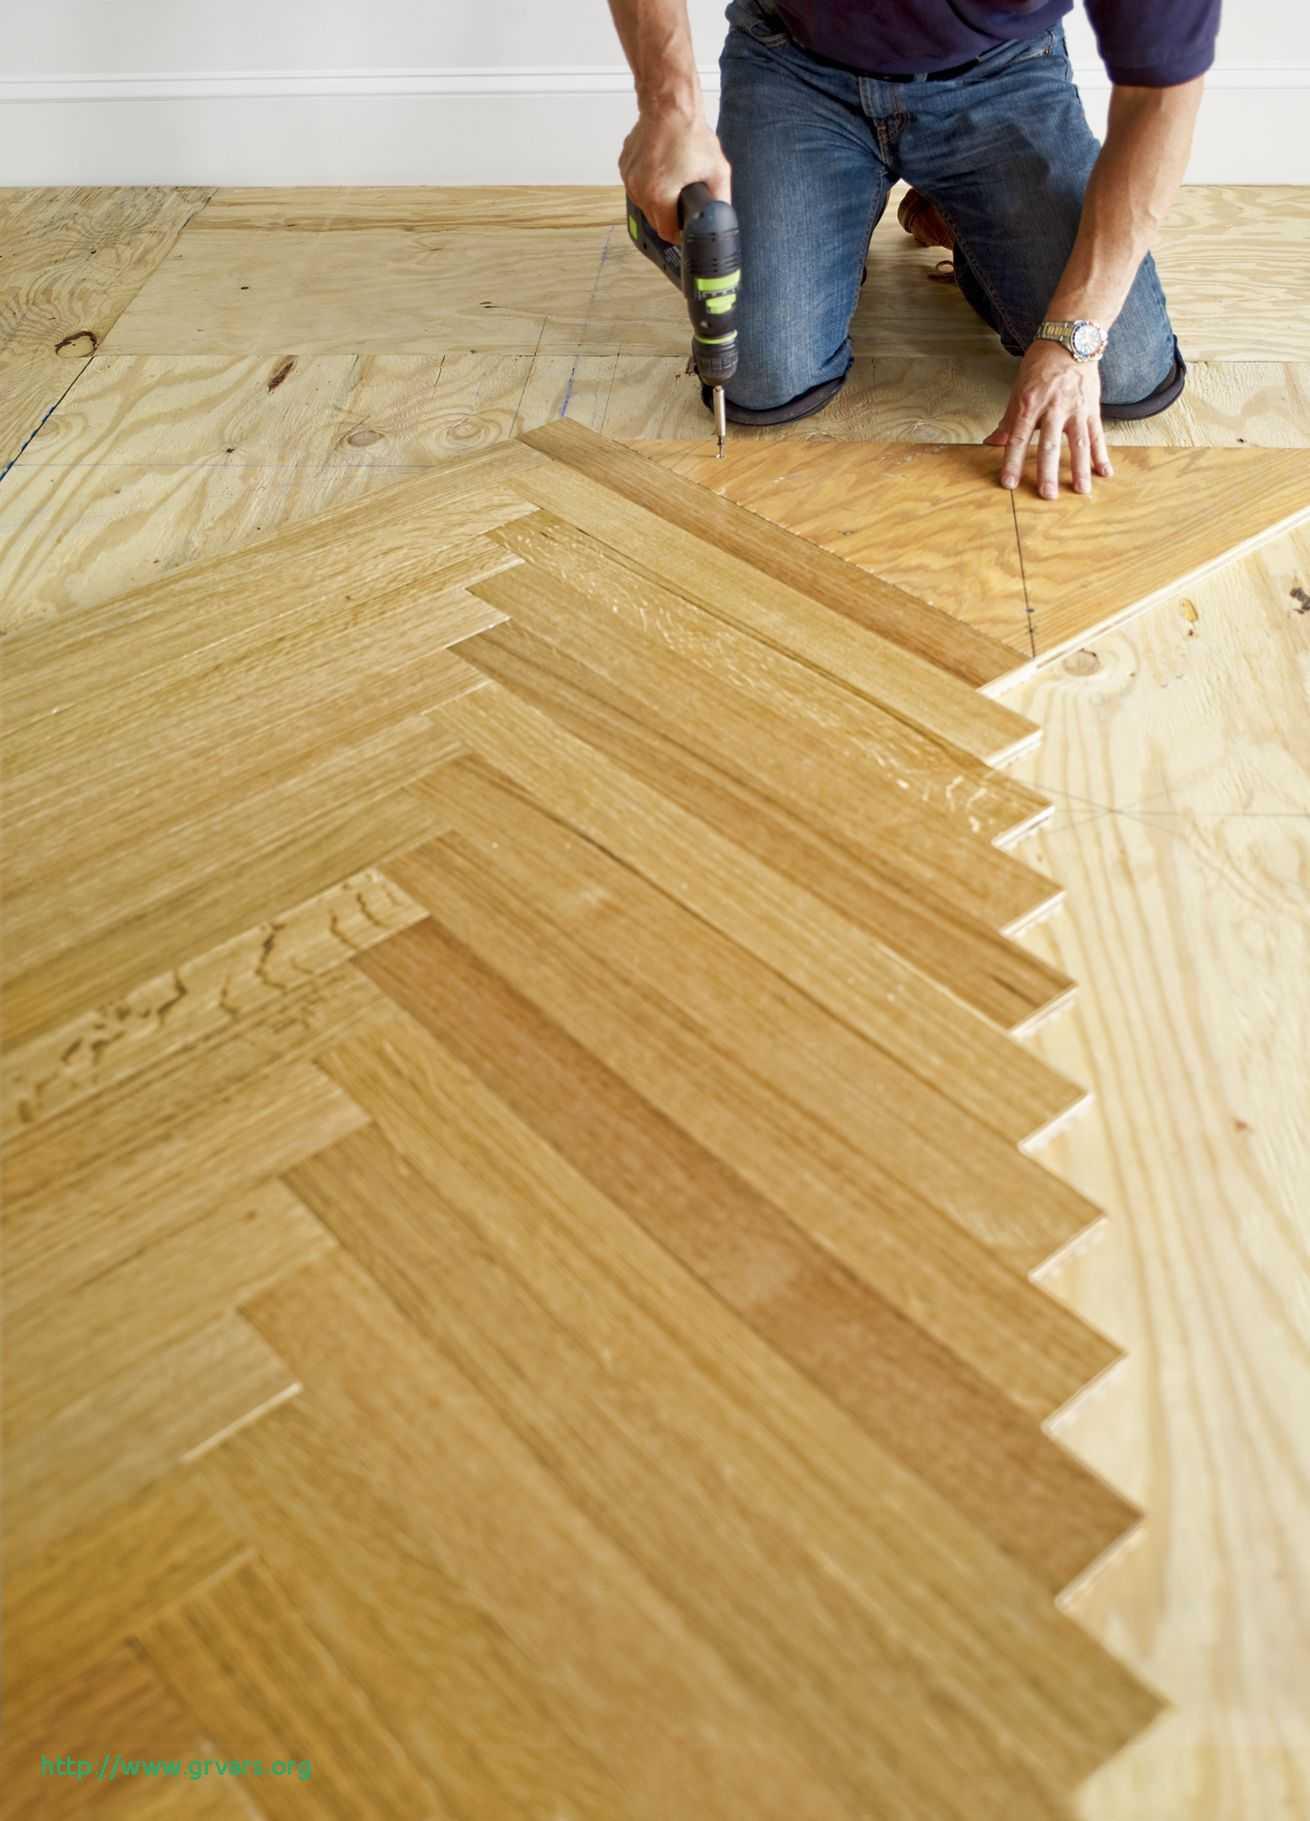 hardwood floor installation kalamazoo of 21 unique pattern for laying hardwood flooring ideas blog within pattern for laying hardwood flooring impressionnant how to install a herringbone floor pinterest